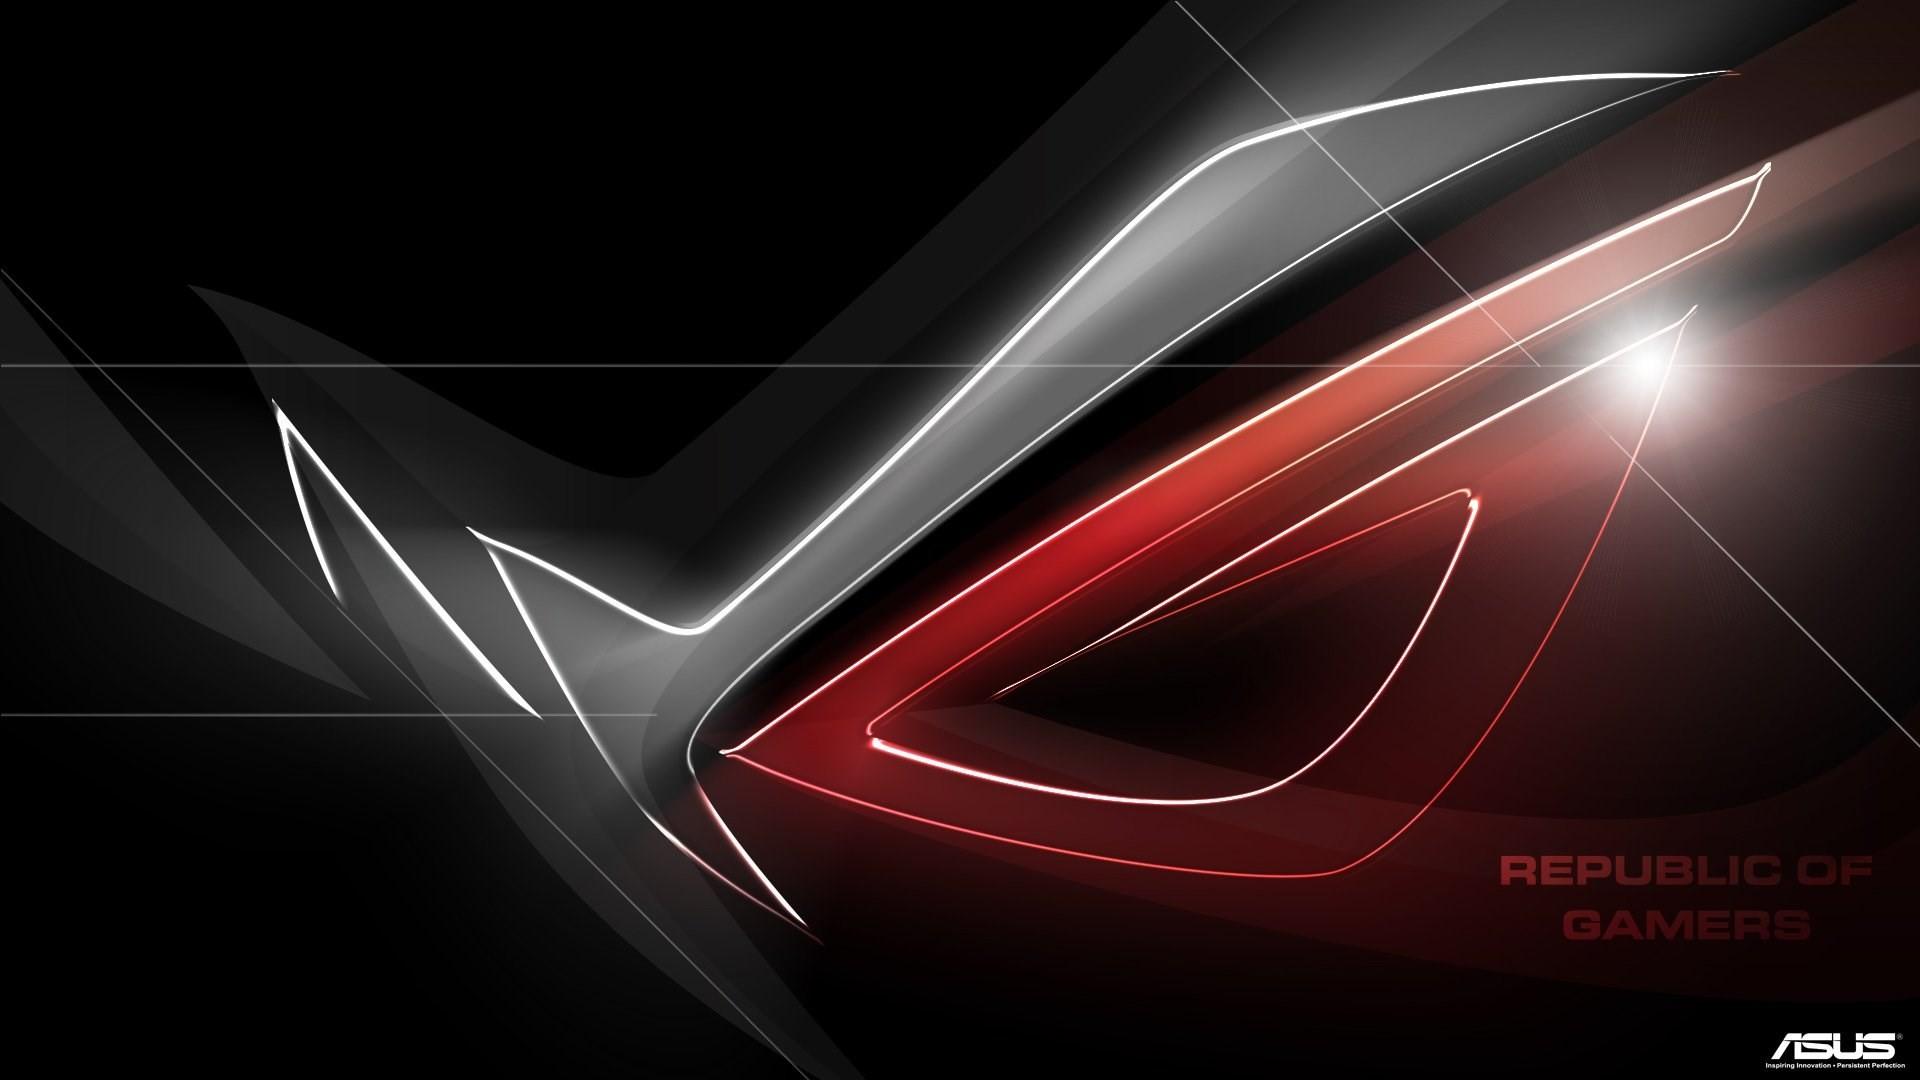 Asus Laptop Wallpaper: Asus Desktop Backgrounds (74+ Images